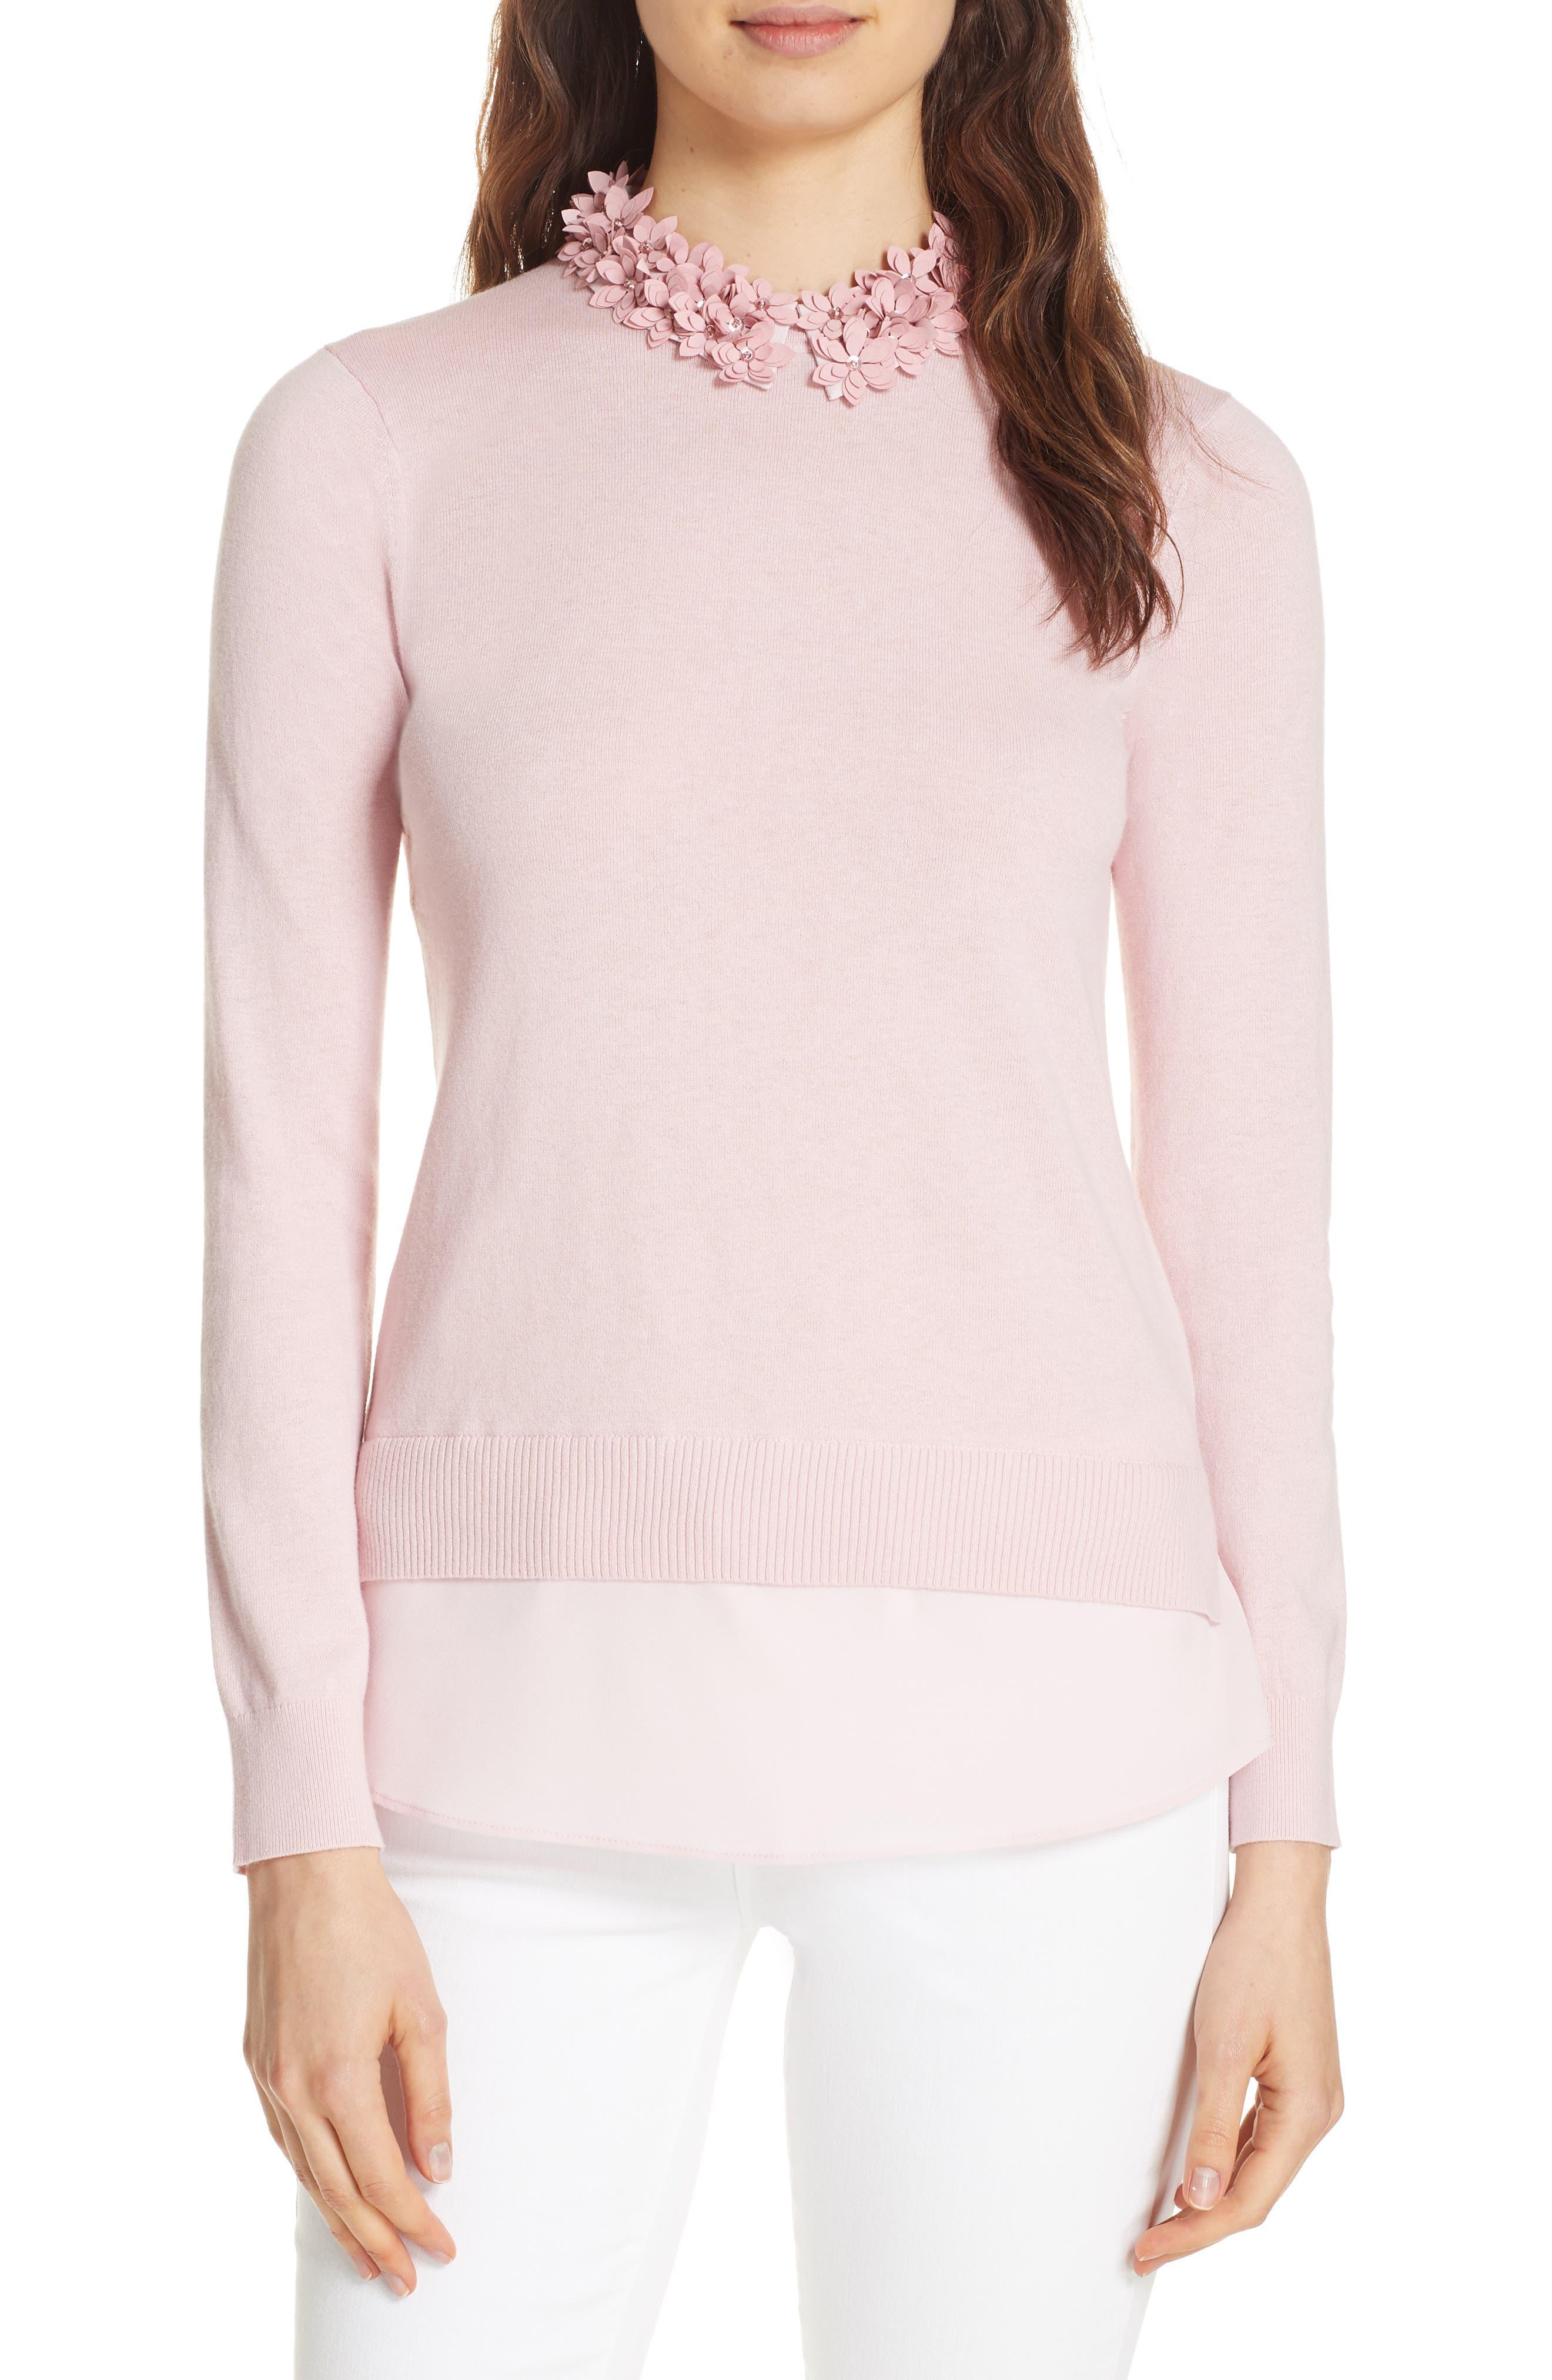 Nansea Floral Collar Tiered Hem Sweater,                         Main,                         color, PINK